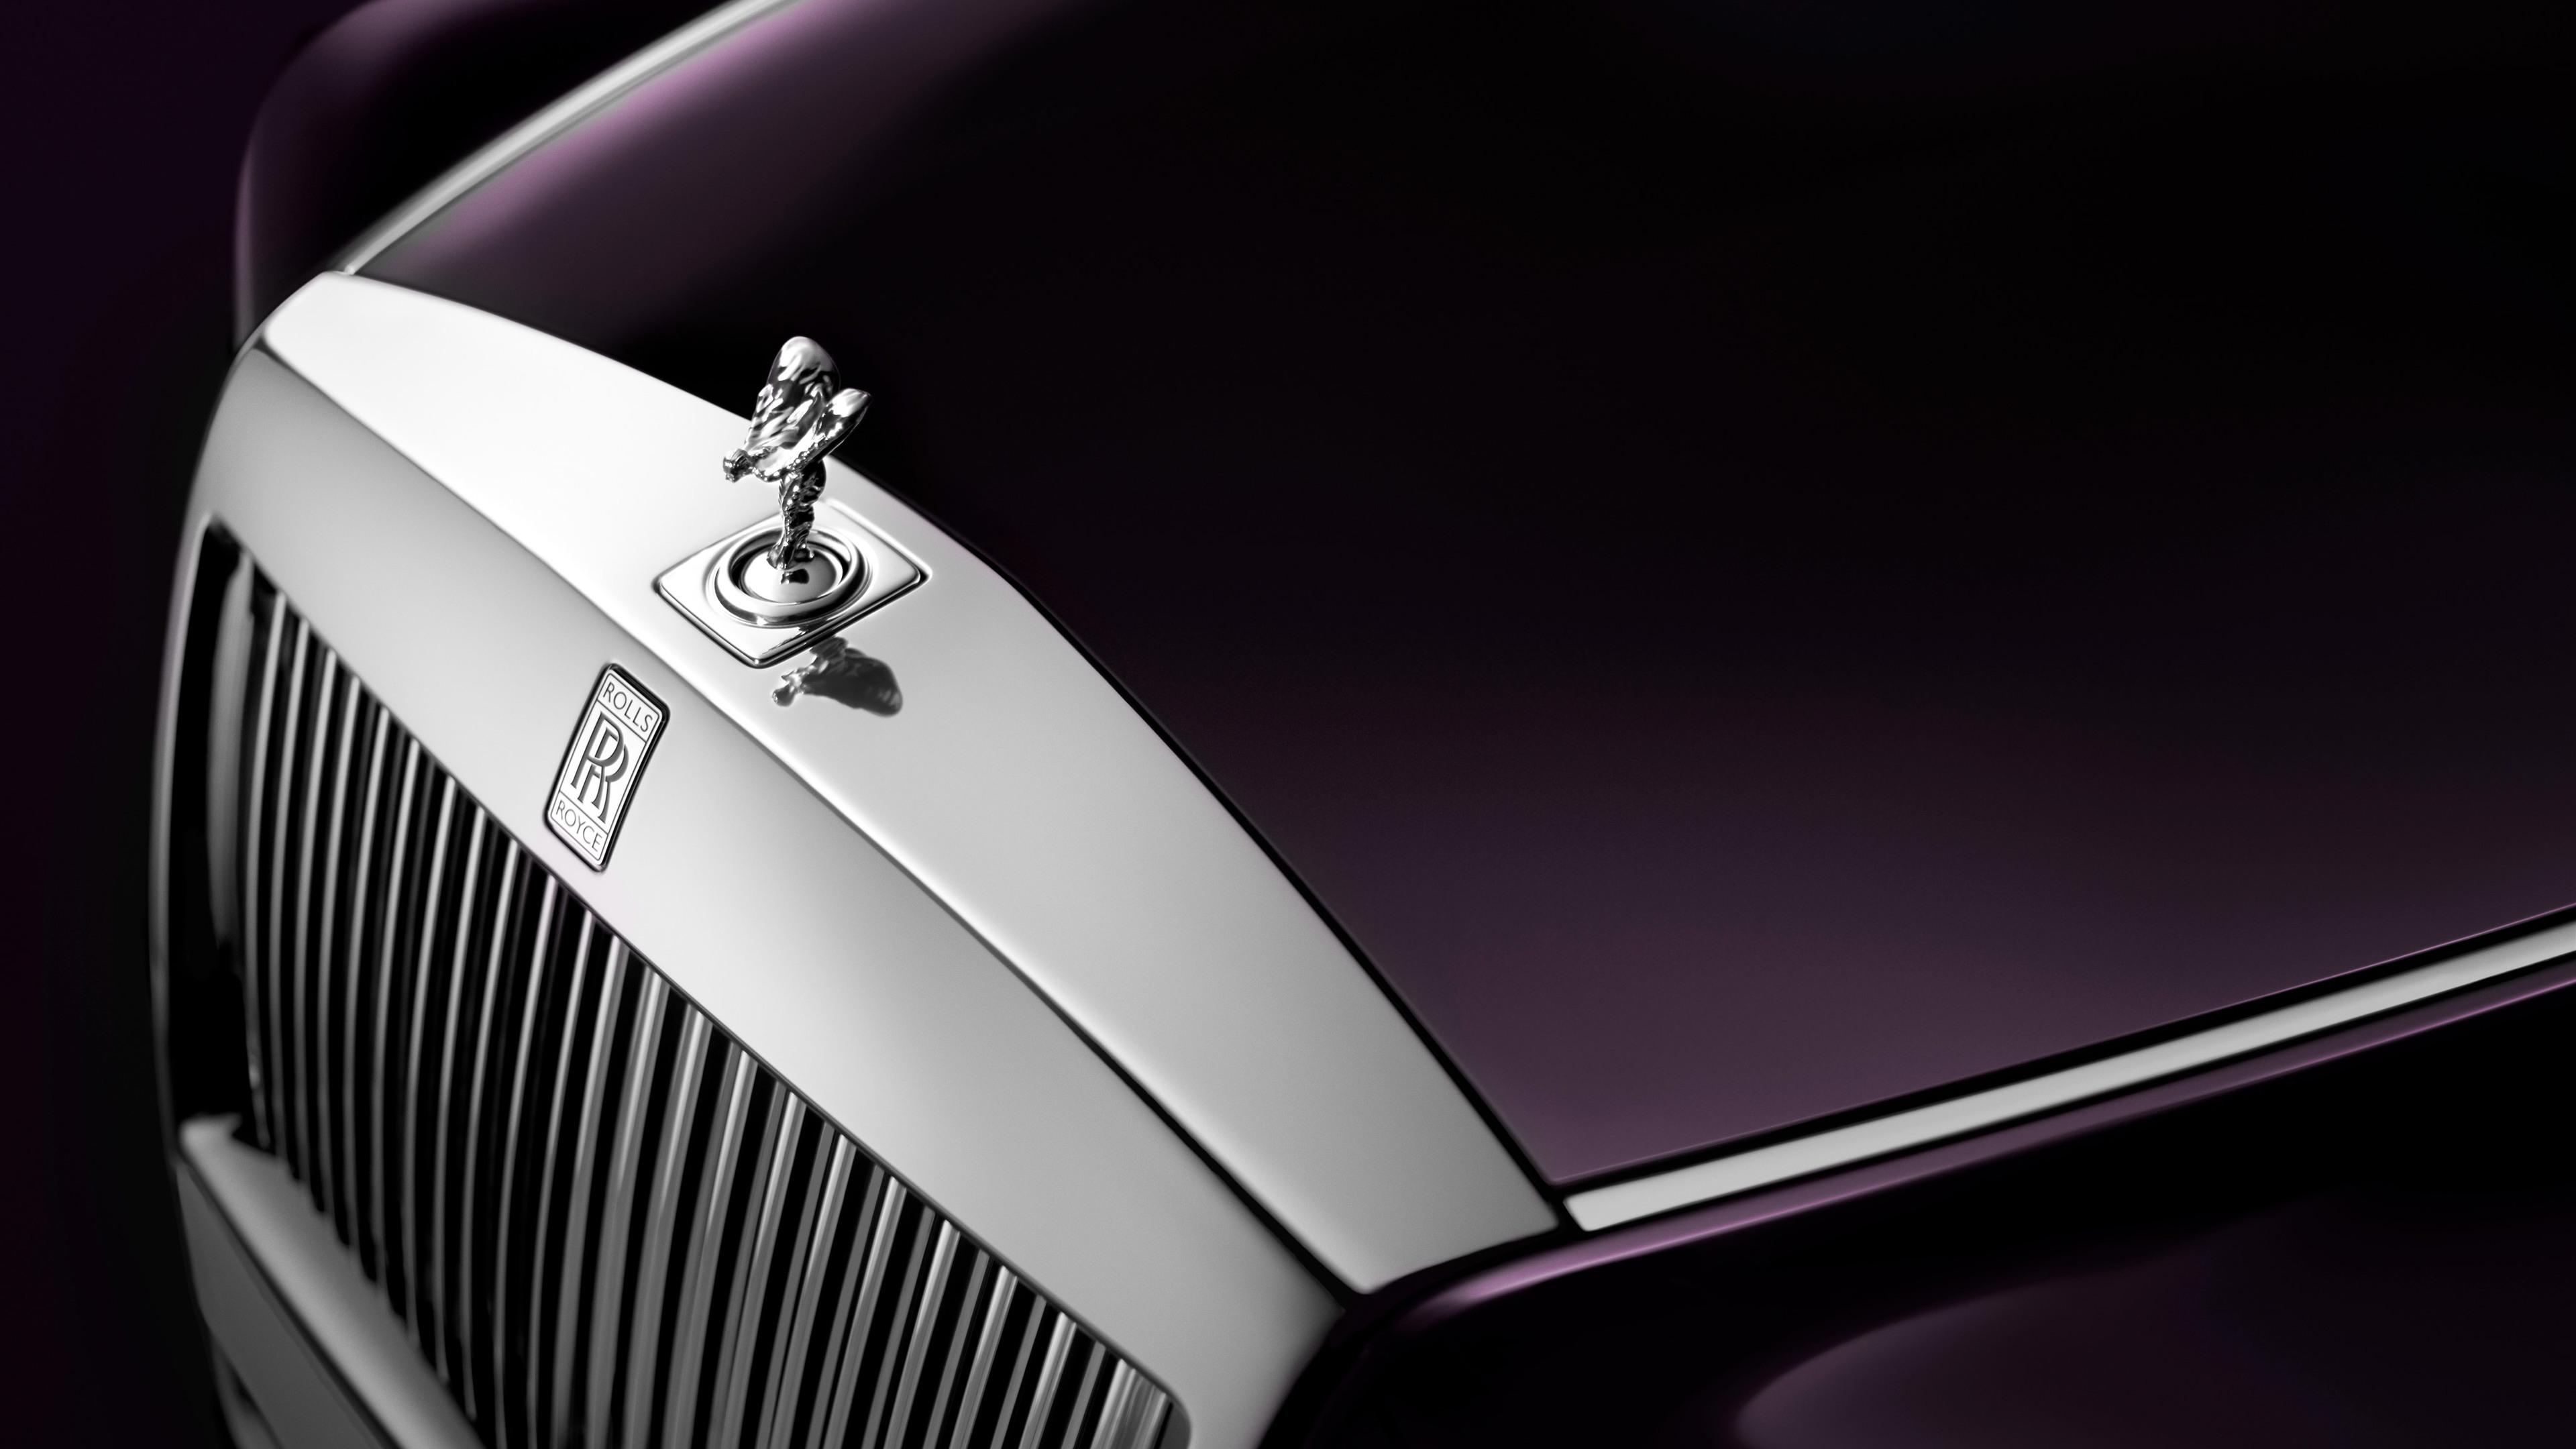 2017 rolls royce phantom ewb front 1539106019 - 2017 Rolls Royce Phantom EWB Front - rolls royce wallpapers, rolls royce phantom wallpapers, rolls royce phantom ewb wallpapers, hd-wallpapers, cars wallpapers, 4k-wallpapers, 2017 cars wallpapers